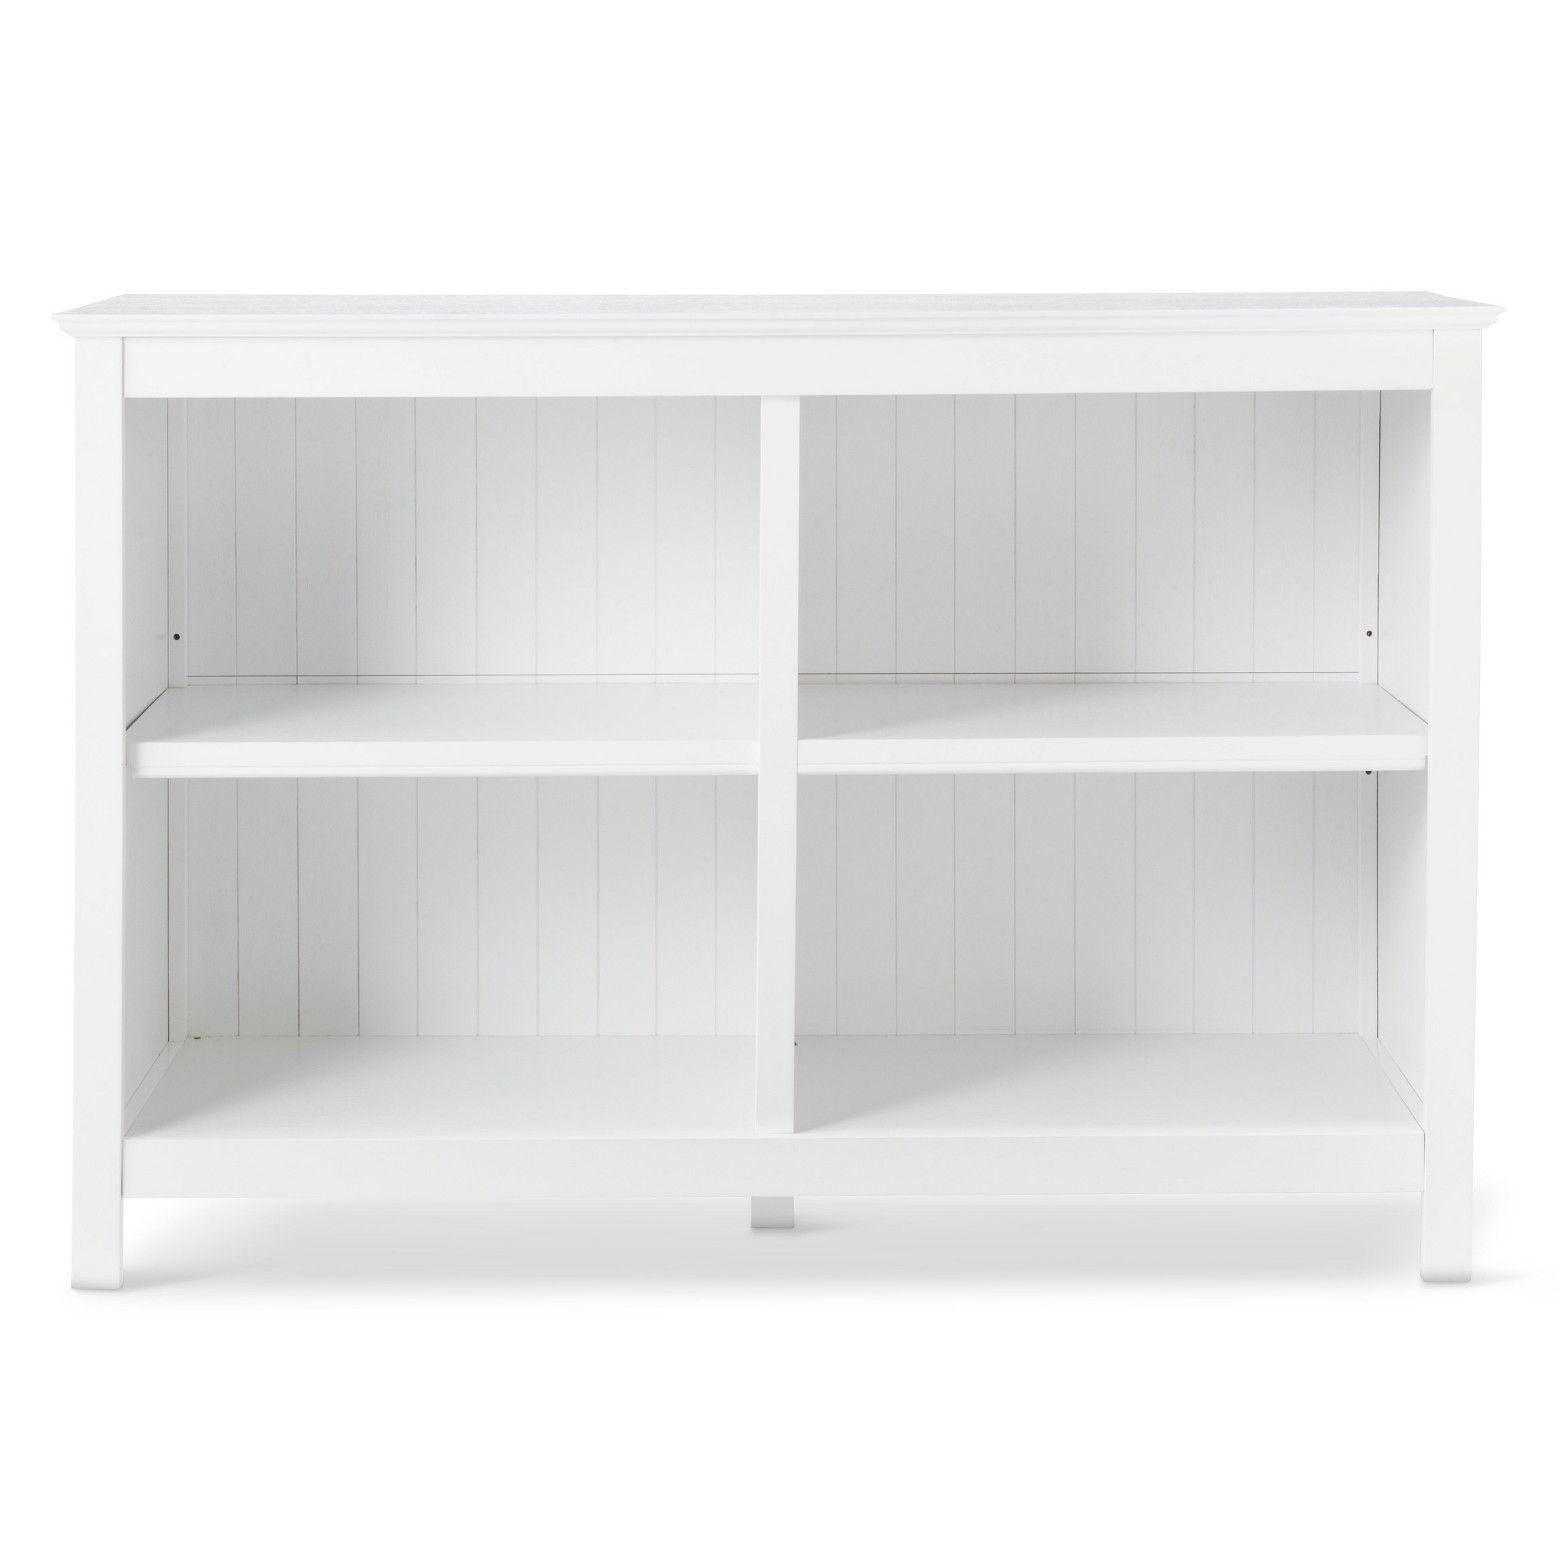 Stafford Horizontal Bookcase 132 99 Target